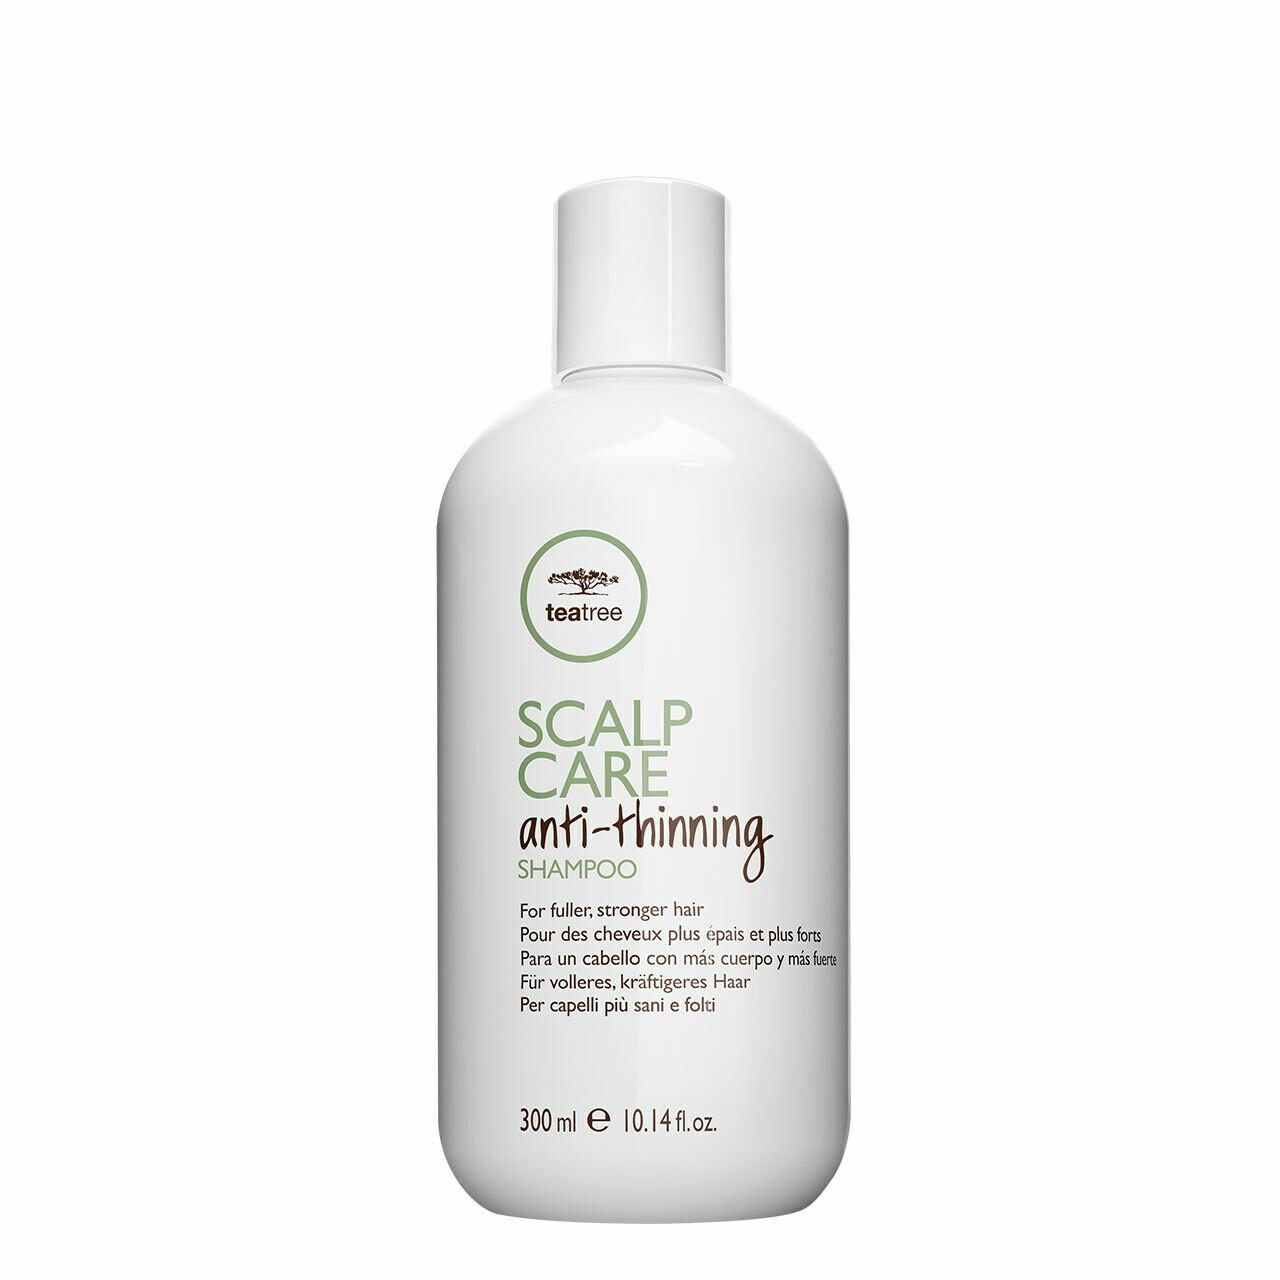 Scalp Care Anti Thinning Shampoo 300ml